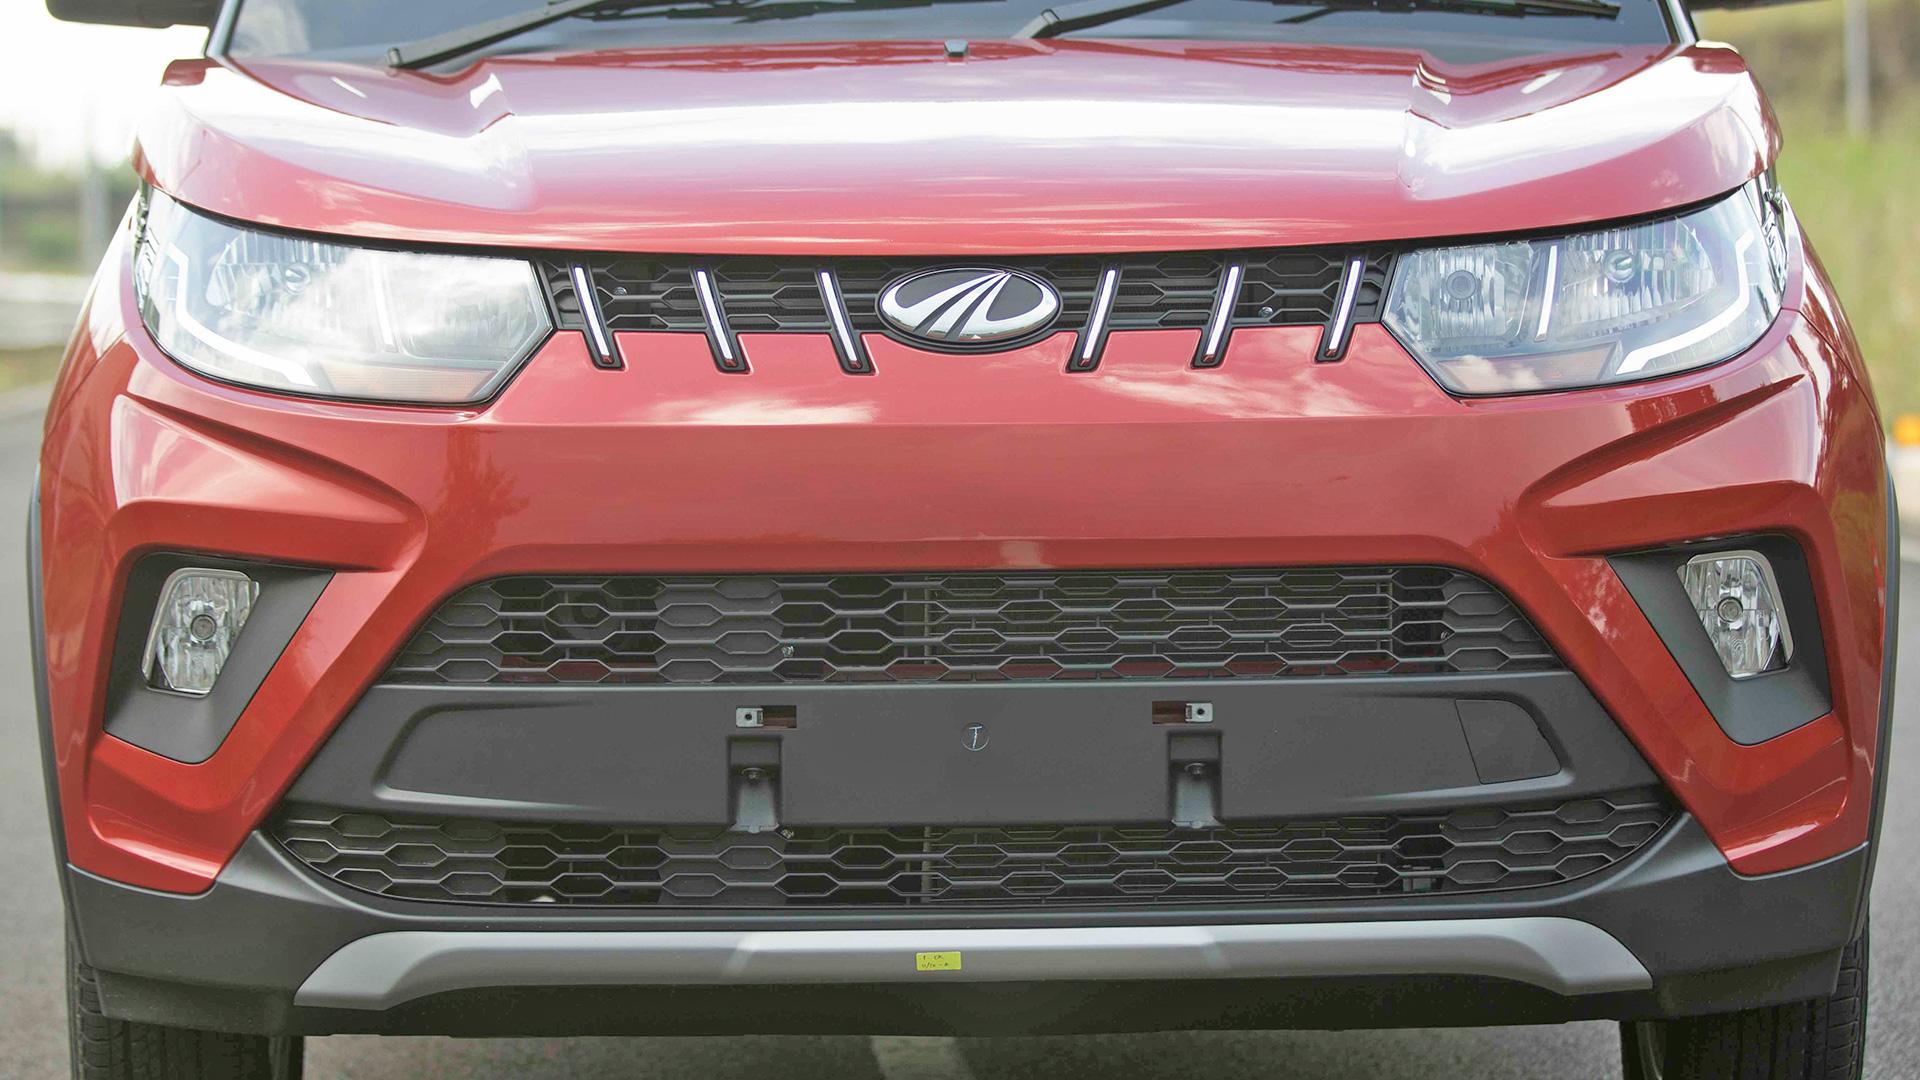 Mahindra KUV 100 NXT 2017 K8 Petrol 6 Str Exterior